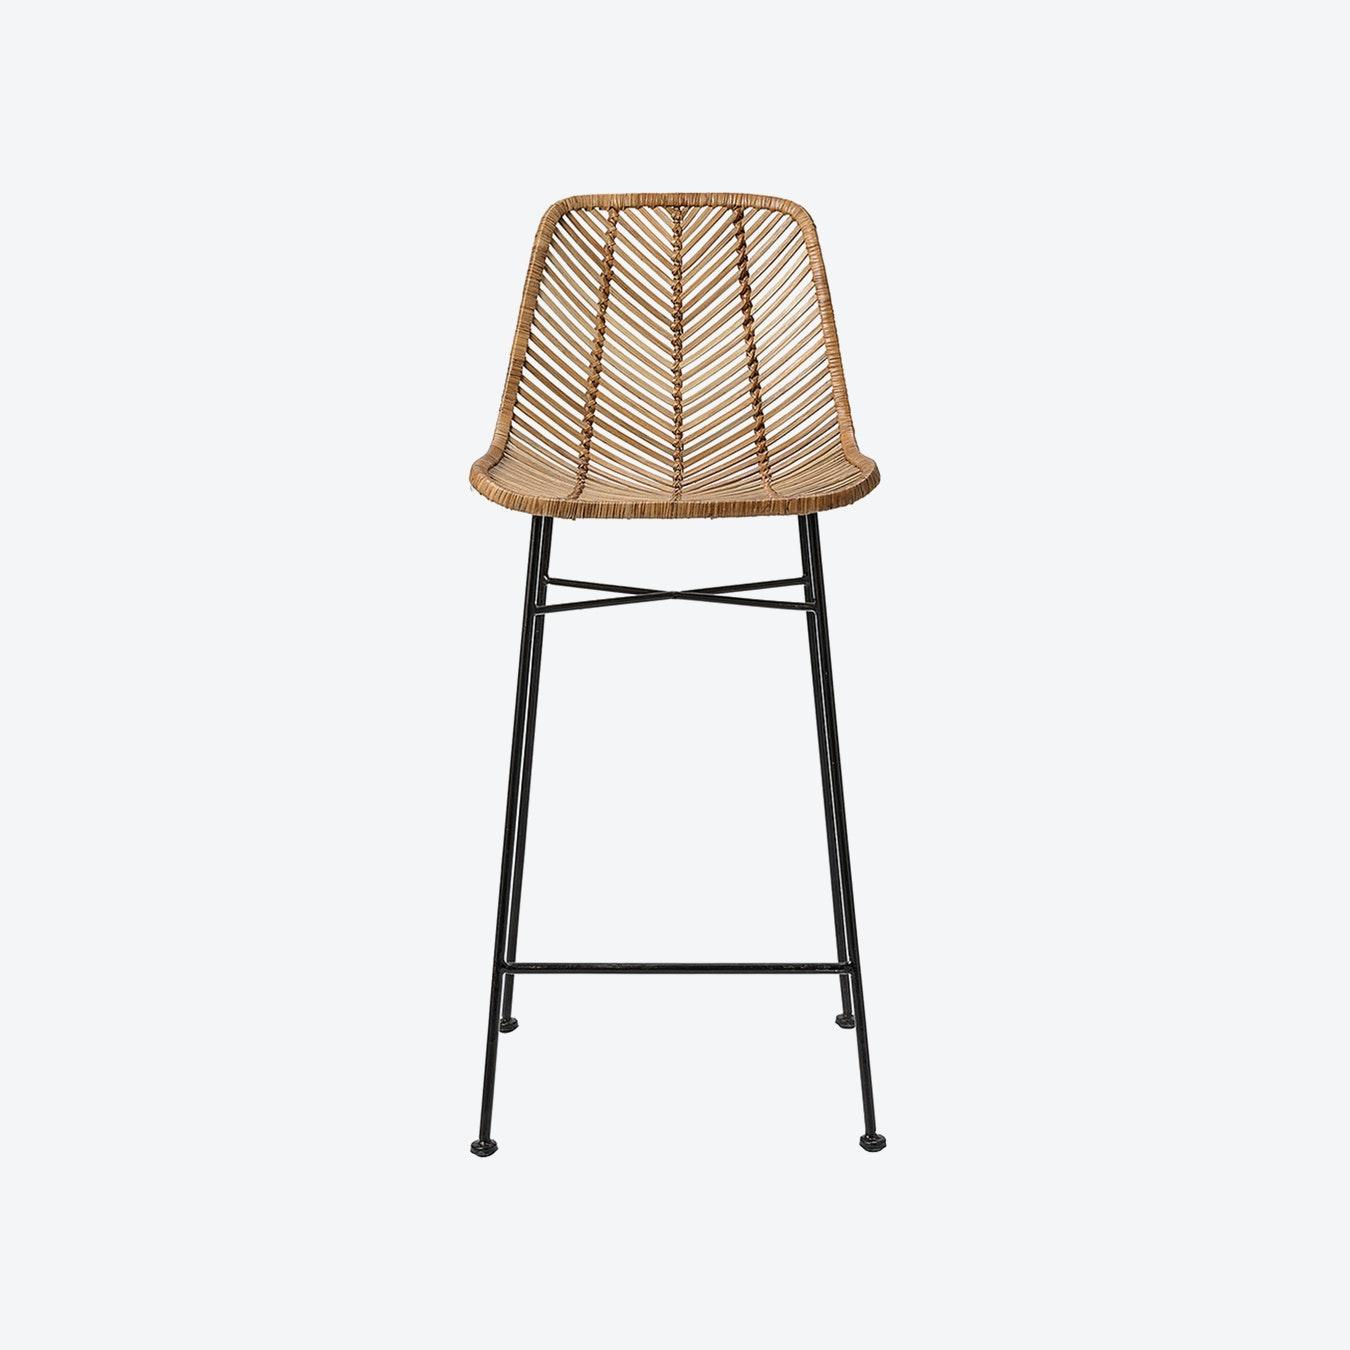 Incredible Bali Bar Stool Natural Rattan Ncnpc Chair Design For Home Ncnpcorg